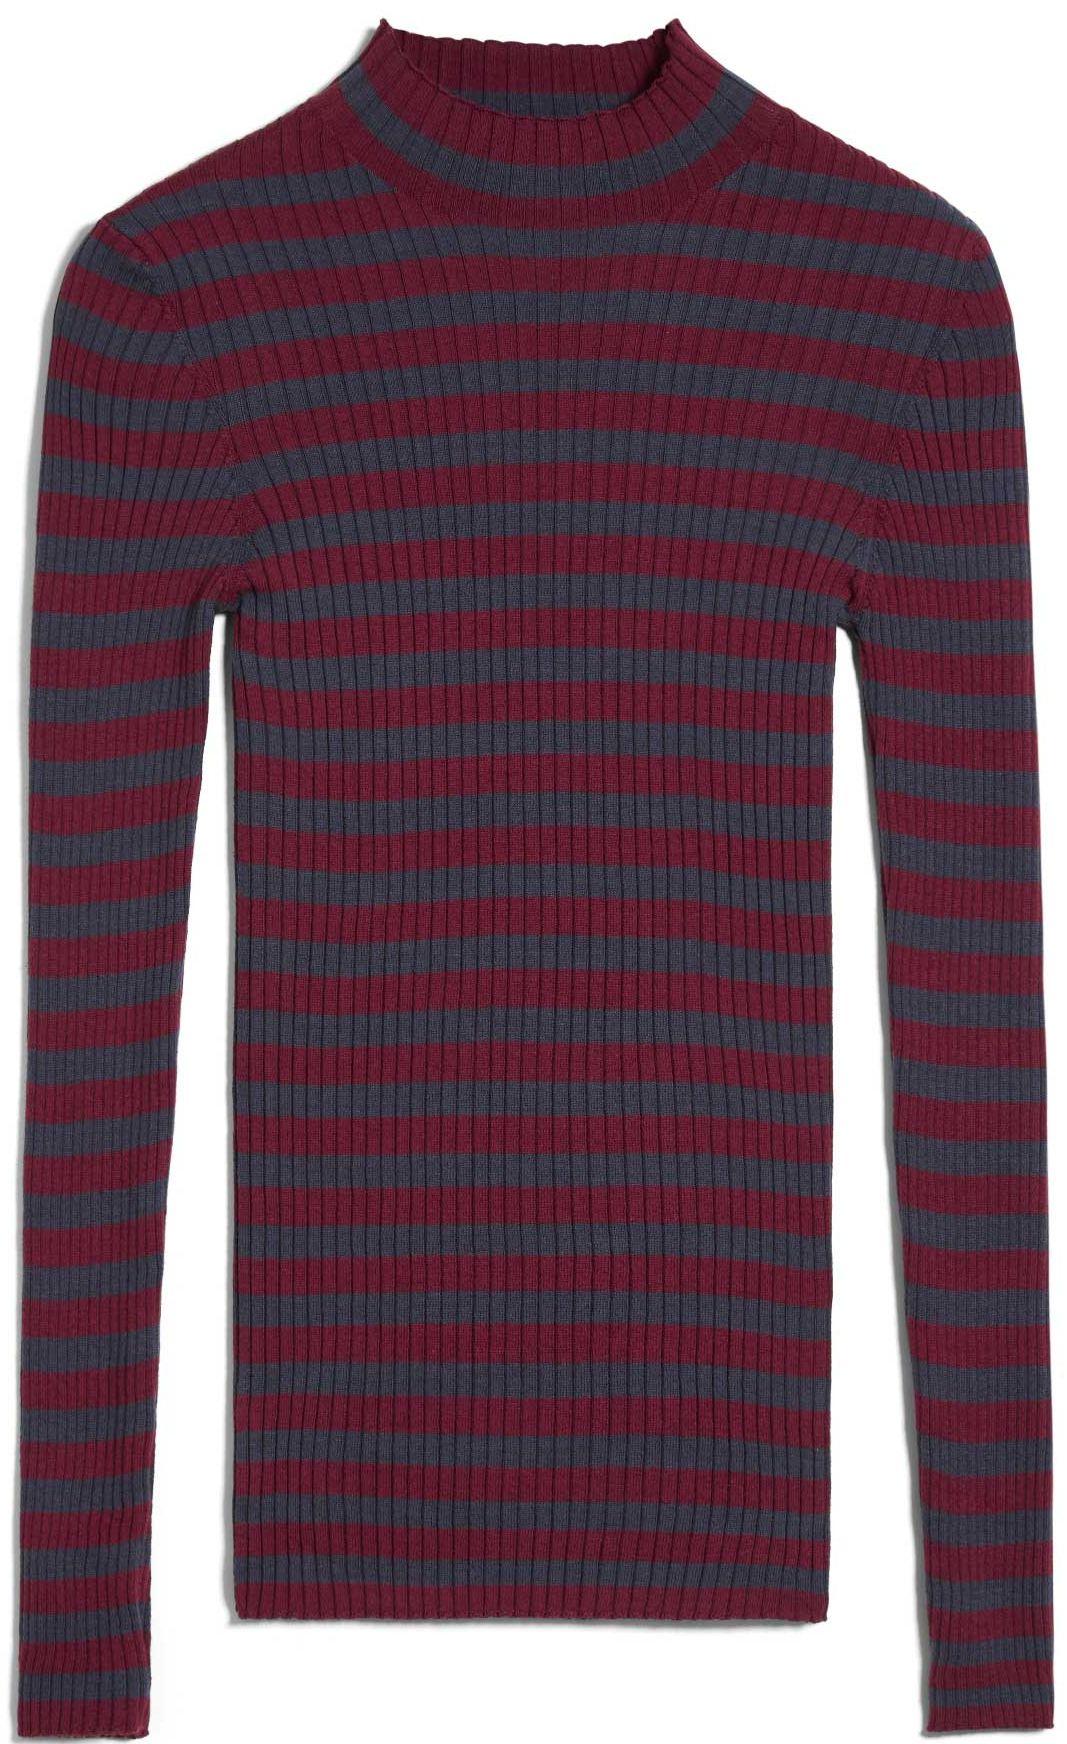 Damen-Pullover ALAANI STRIPED ruby red/ indigo